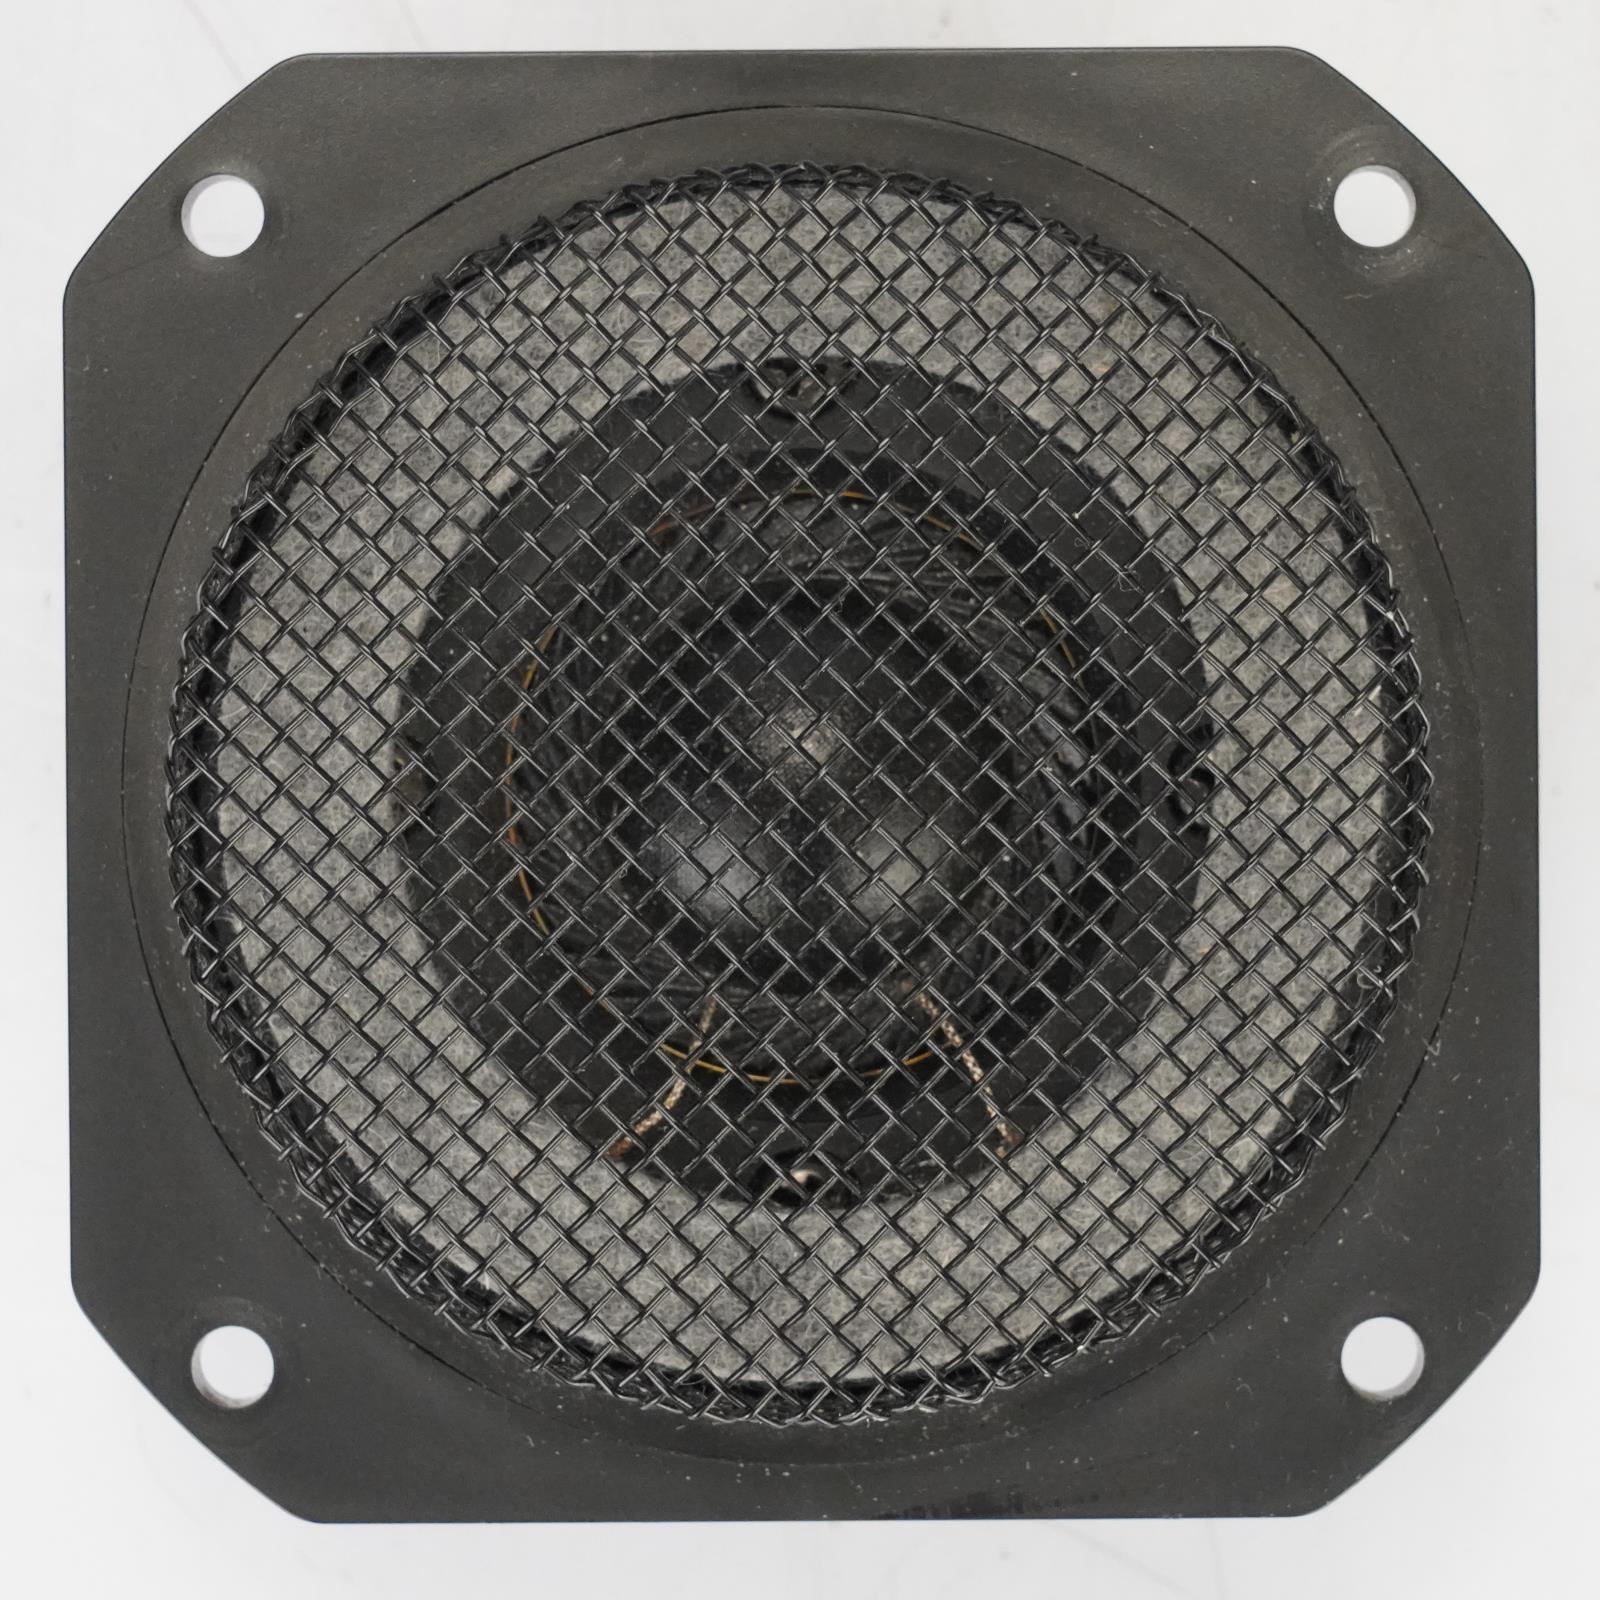 Yamaha NS-10M Studio JA0518A Factory Speaker Tweeter owned by Ed Cherney #39127